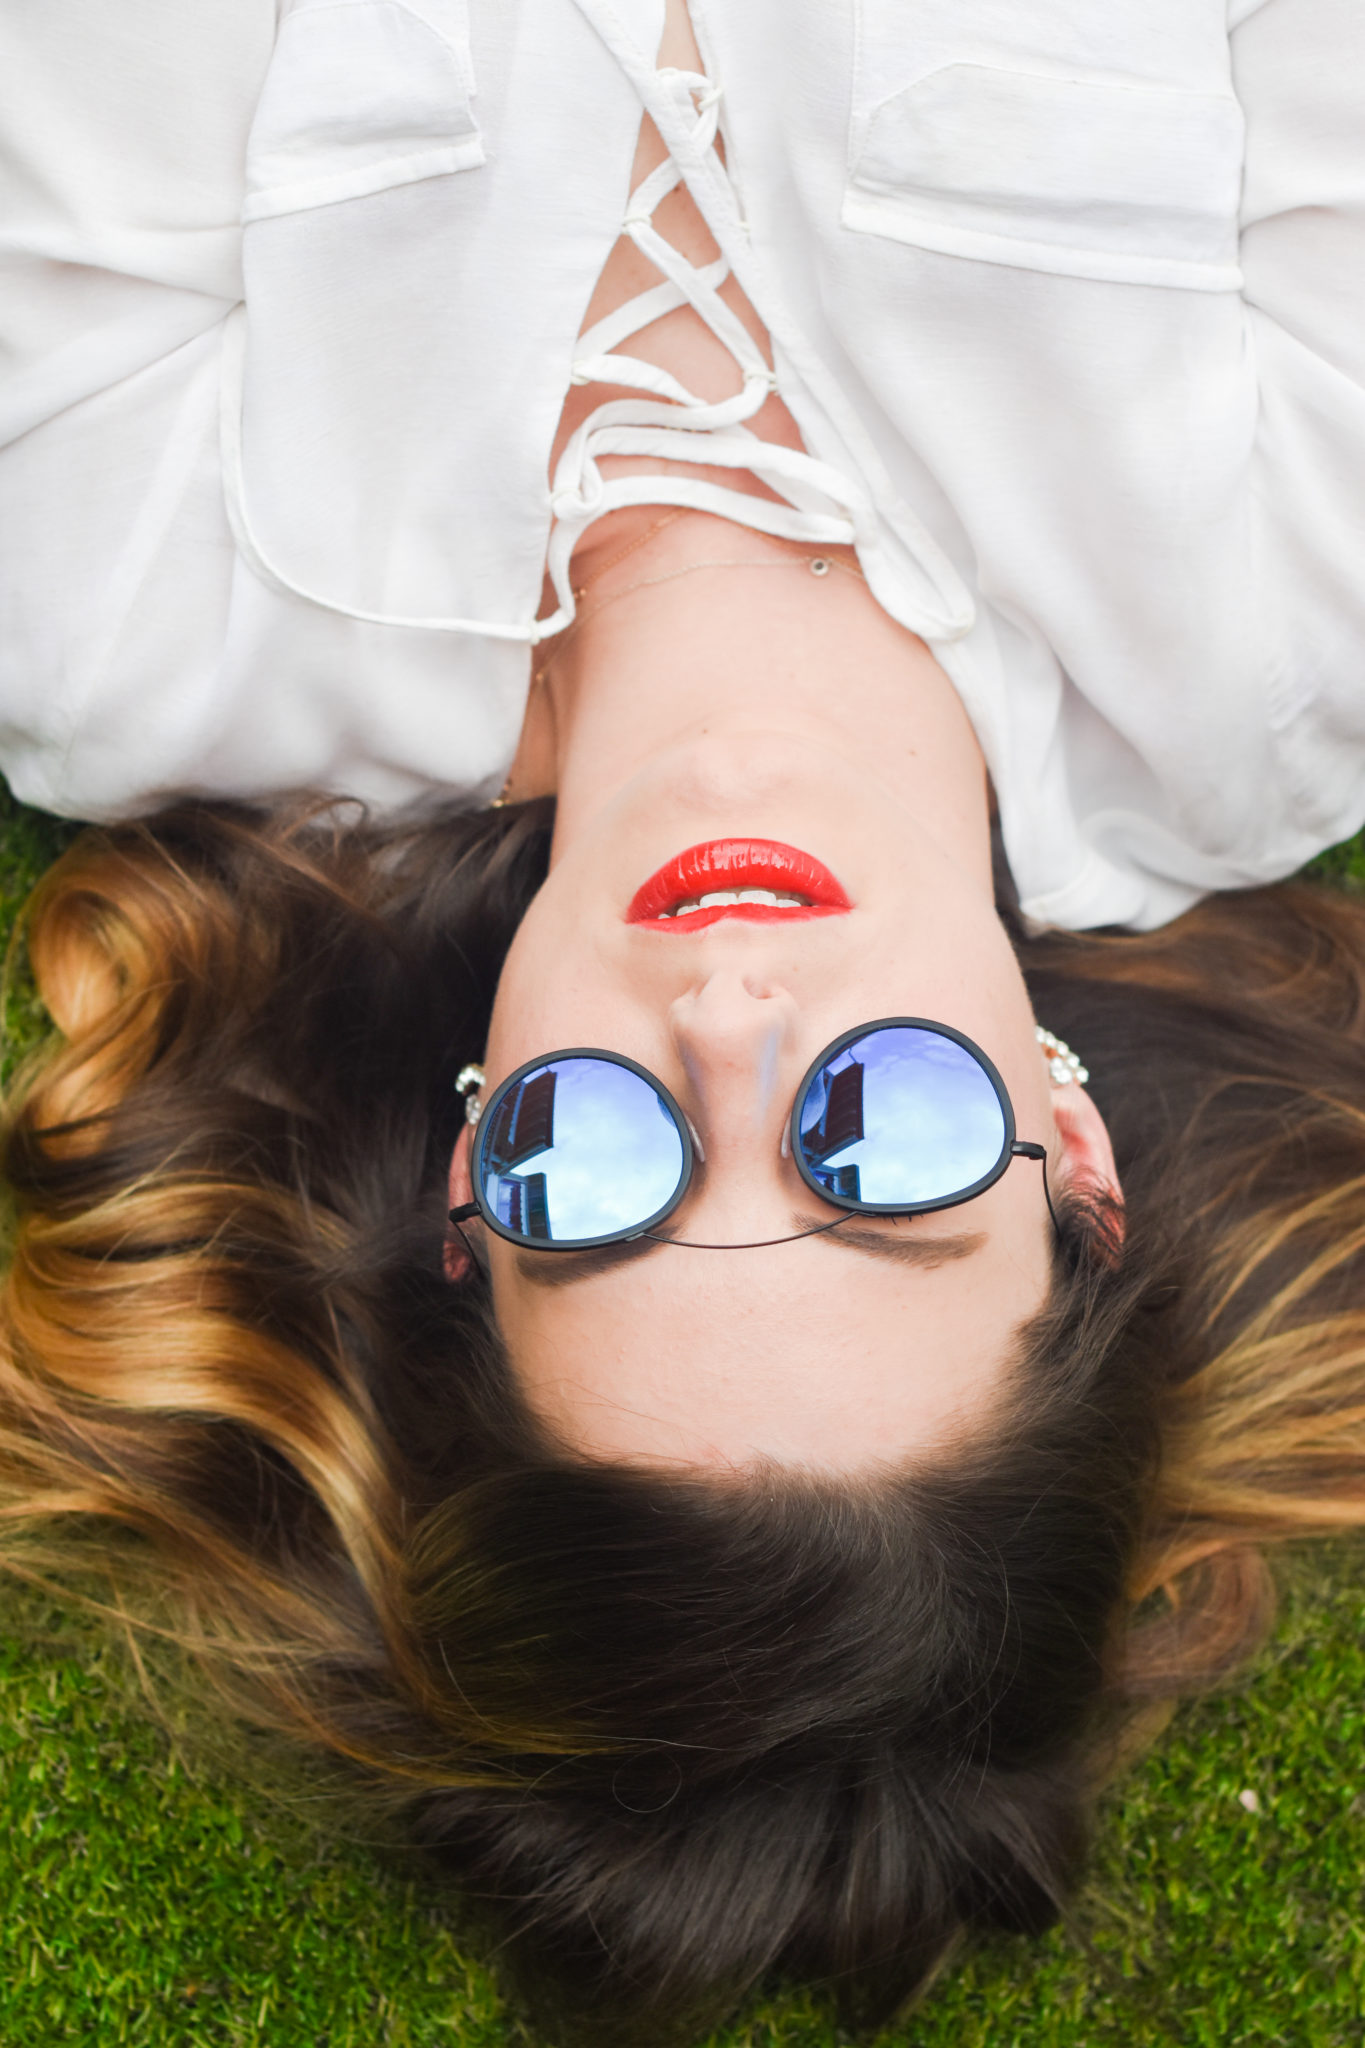 giulia de martin spektre sunglasses eyewear behindmyglasses.com mirror lenses metro 2 flat met-ro sunnies -23